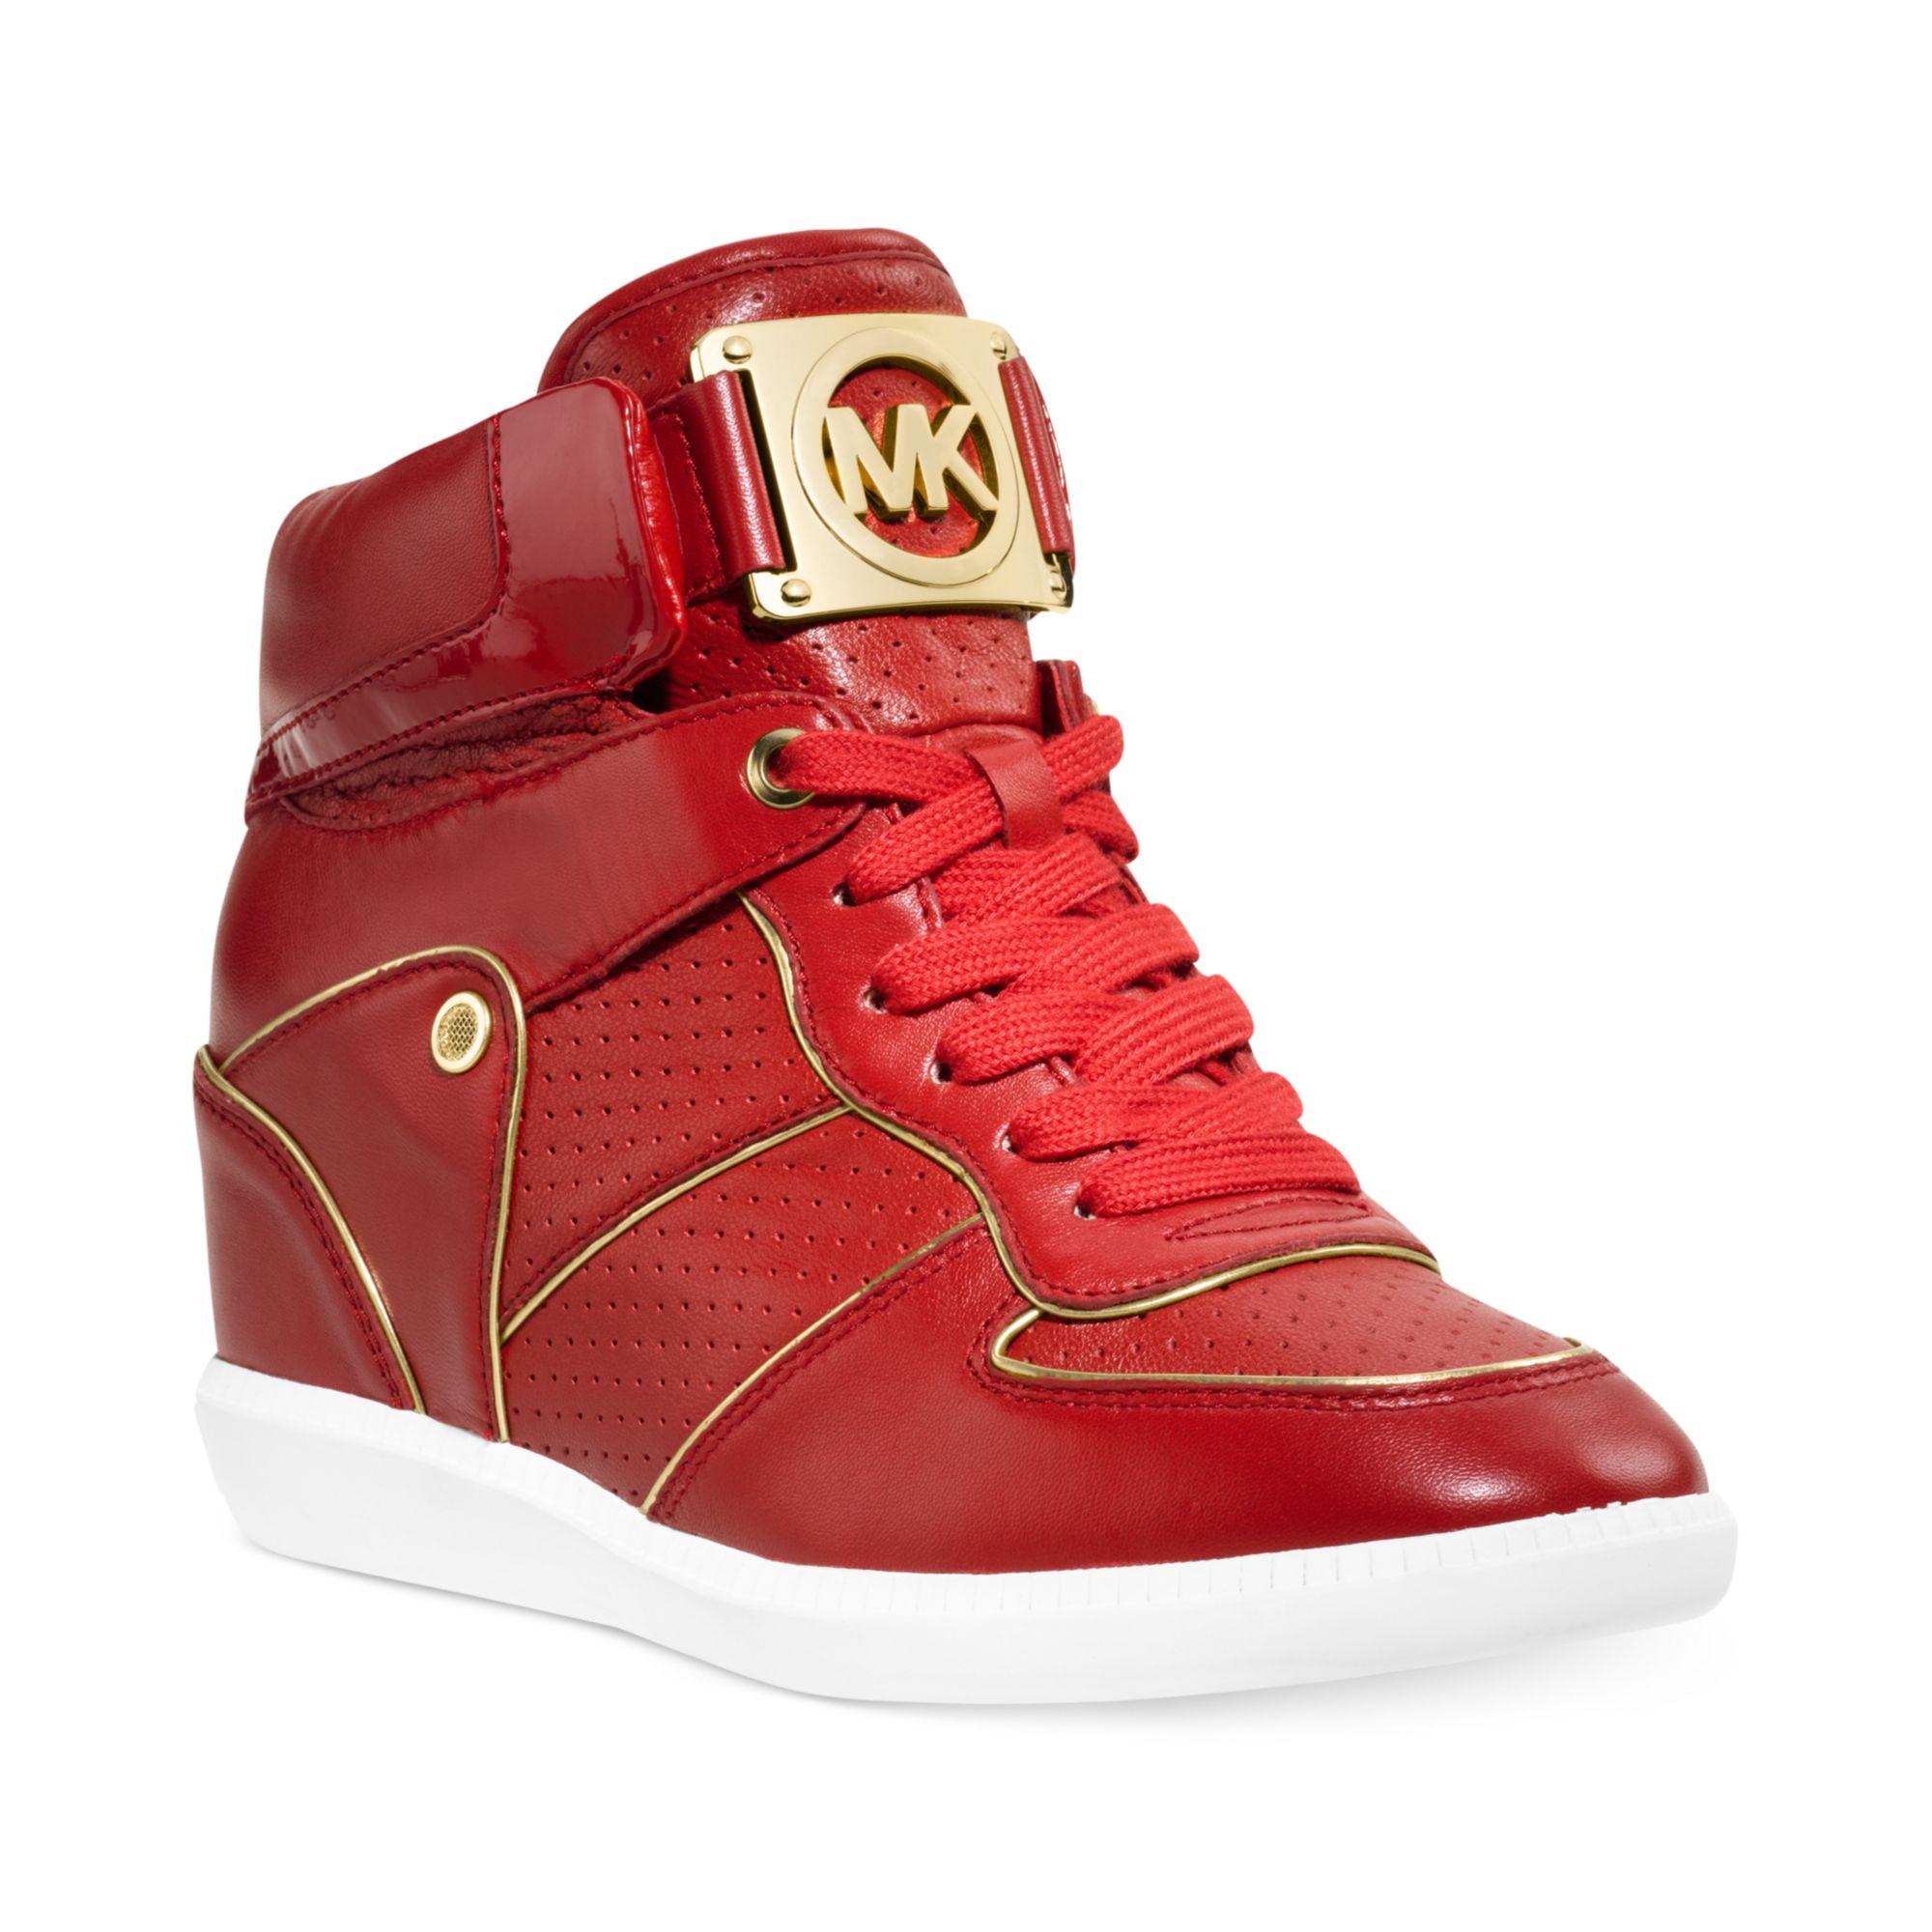 c4812cb285ef5 Lyst - Michael Kors Nikki High Top Logo Sneakers in Red